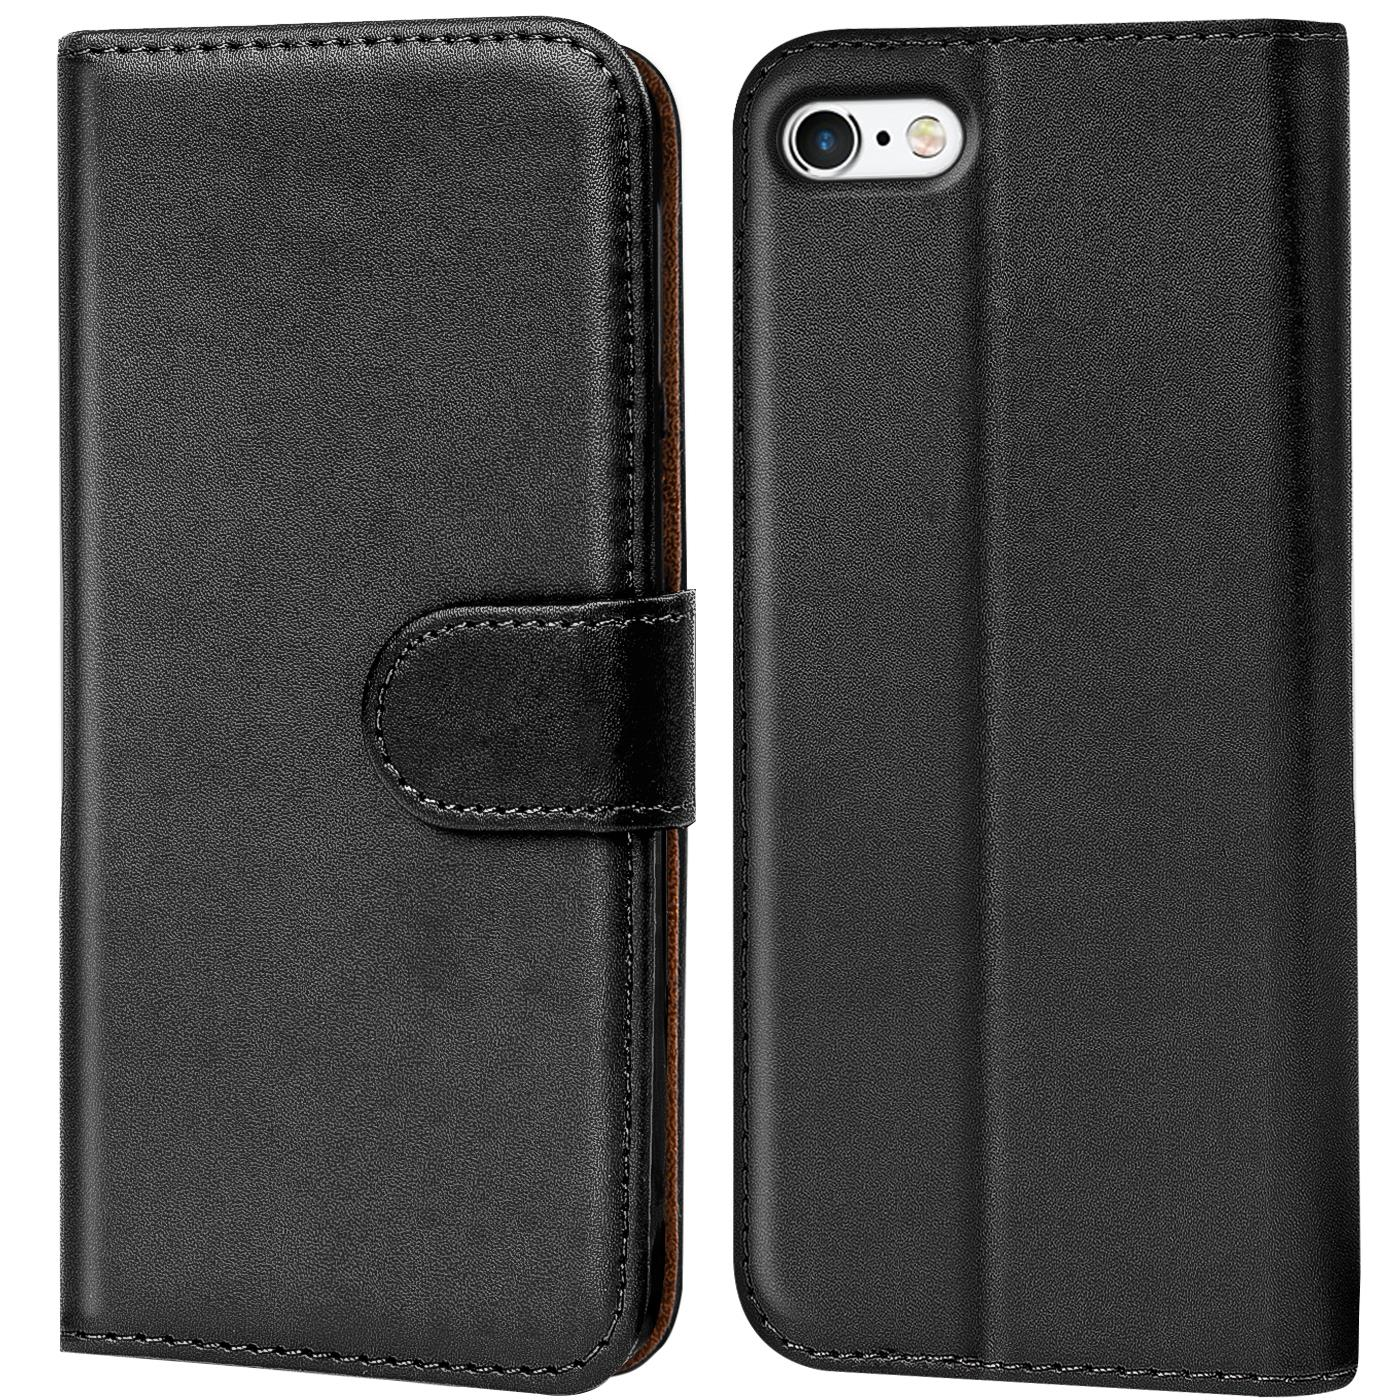 Book-Case-Apple-iPhone-5-5S-SE-Huelle-Klapphuelle-Handy-Tasche-Flip-Cover-Schwarz